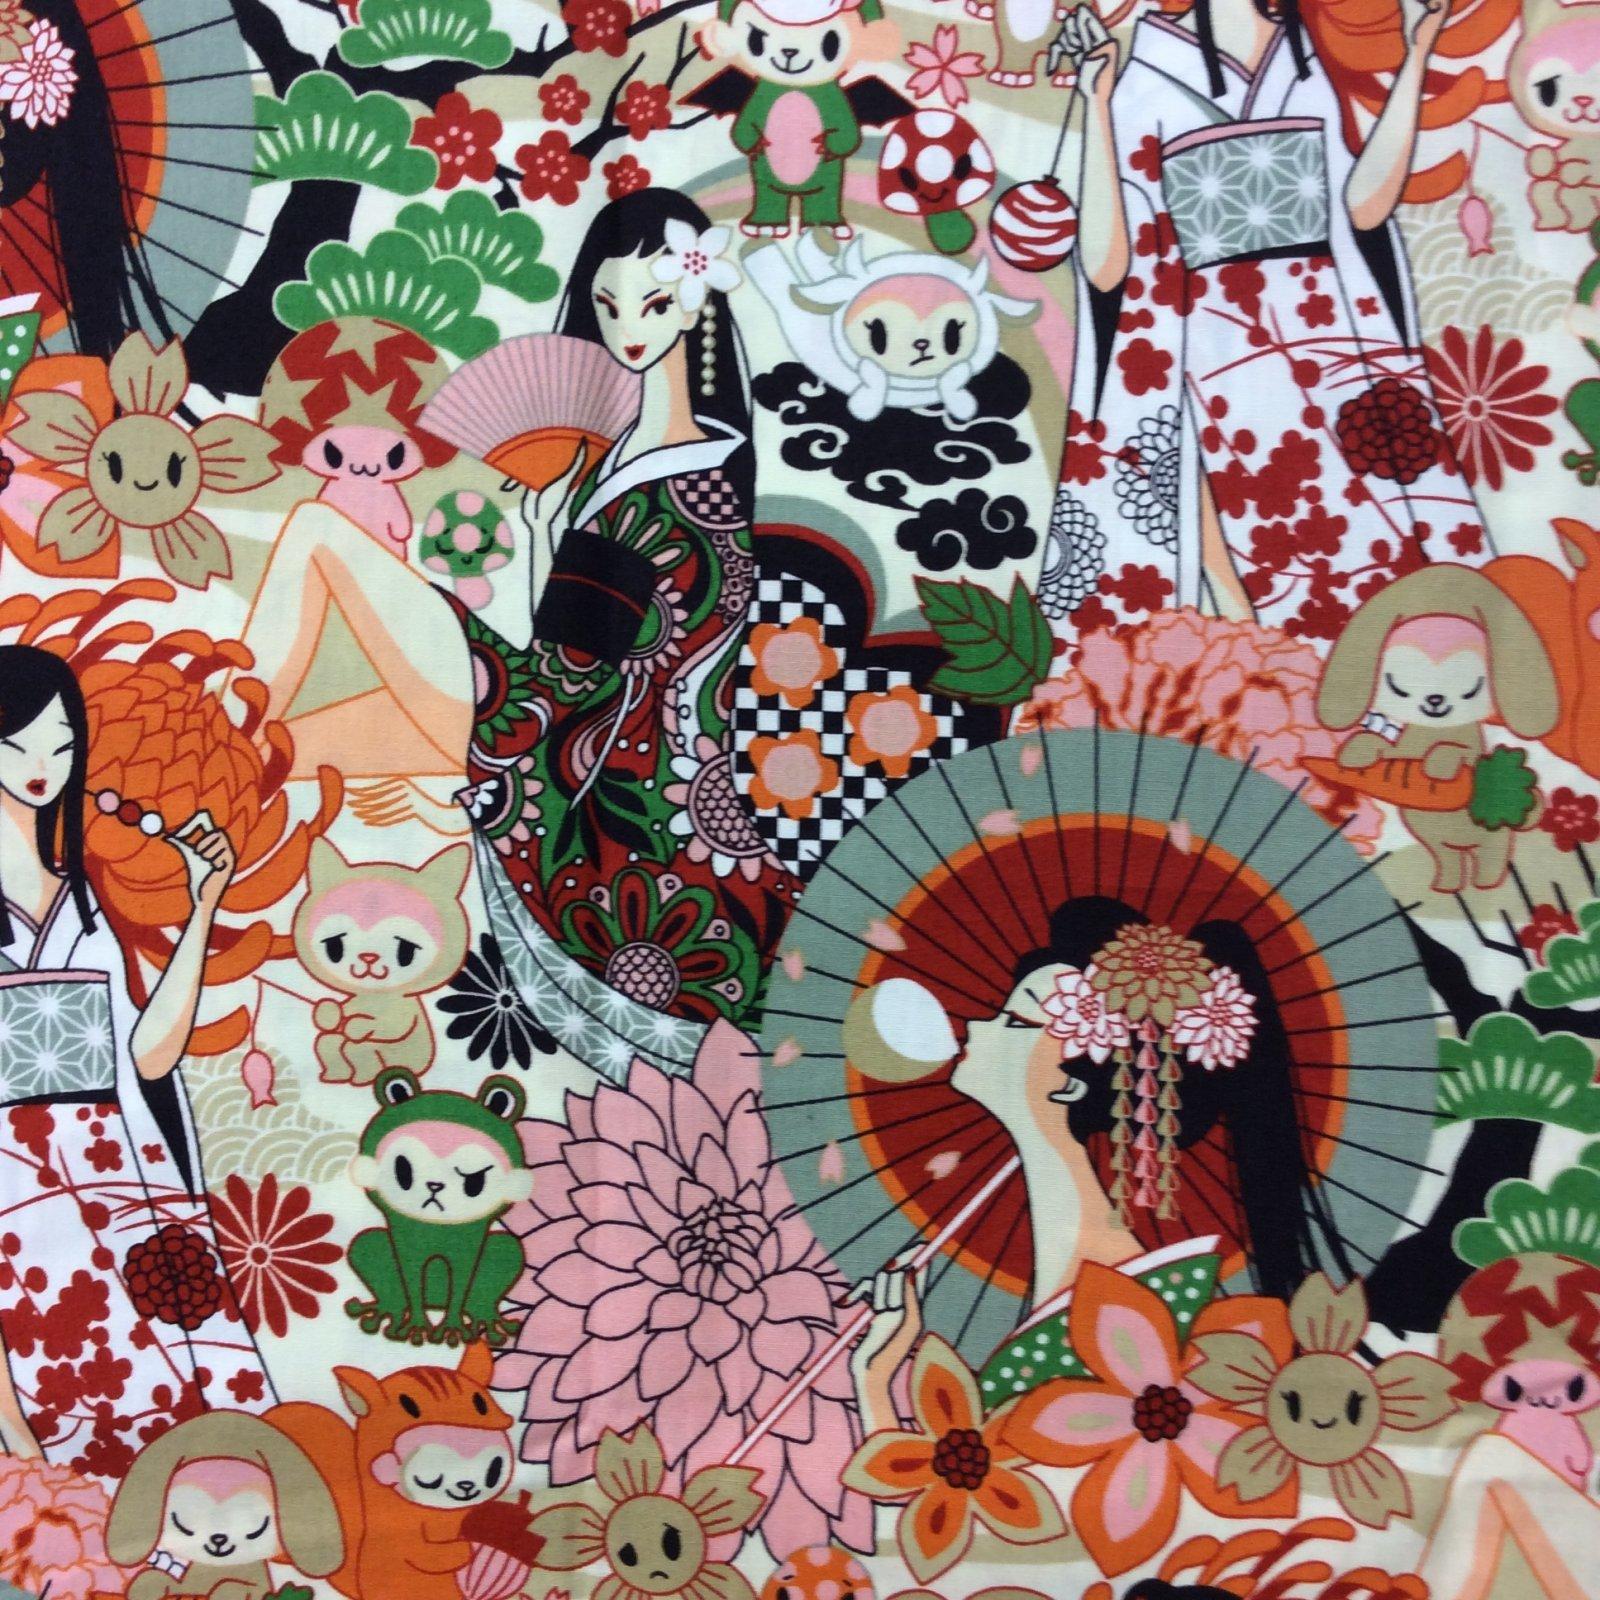 FT31 Japanese Geisha Fashion Oriental Cartoon Anime Quilt Cotton Quilting Fabric